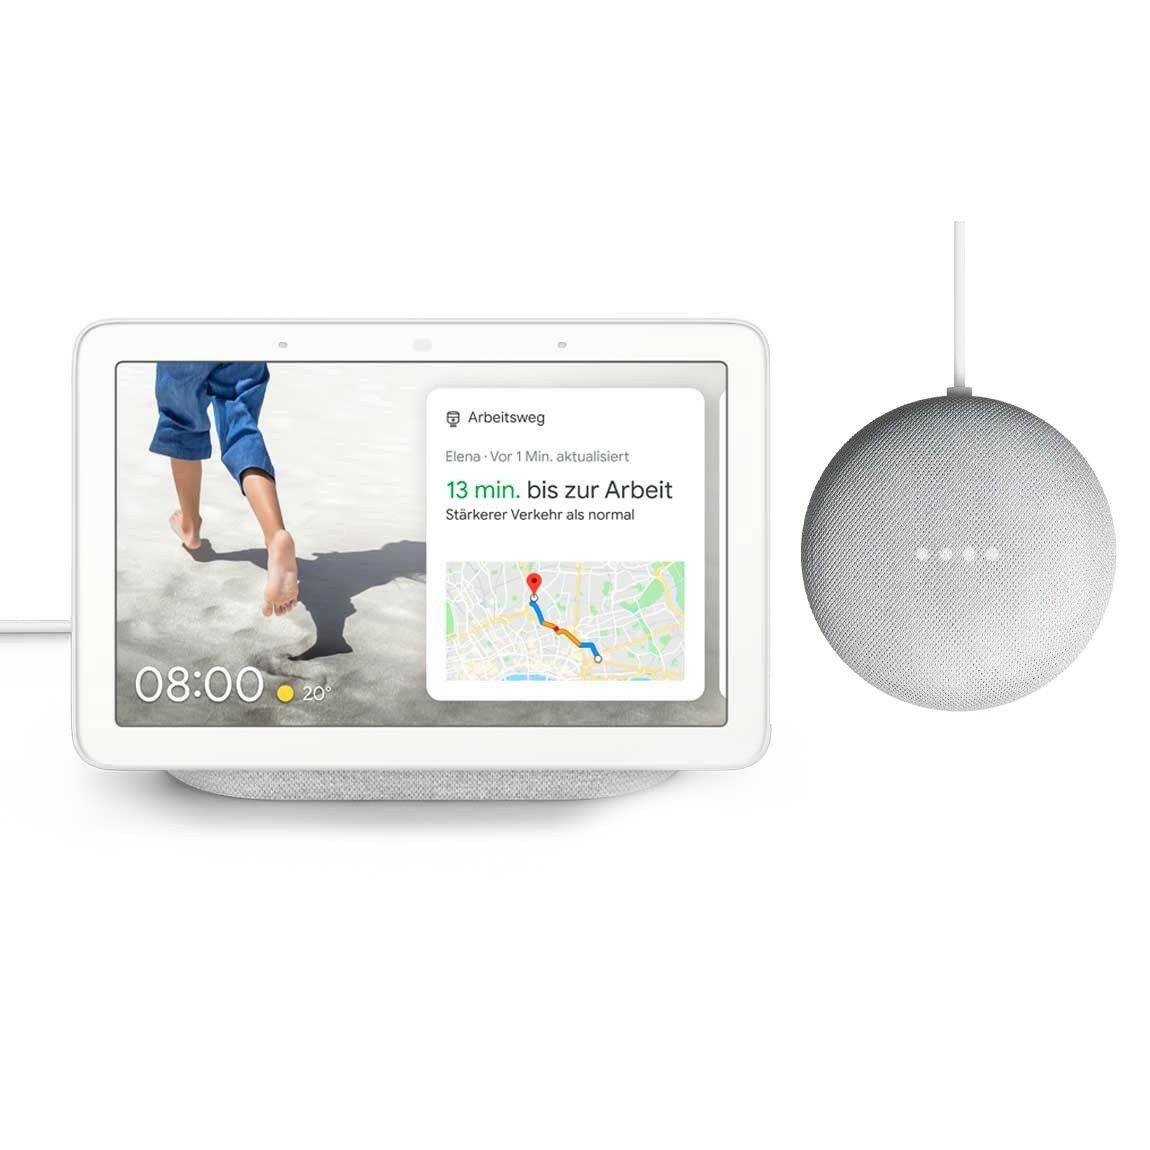 Super Kombo-Aktion für Google Nest Hub + GRATIS Google Nest Mini